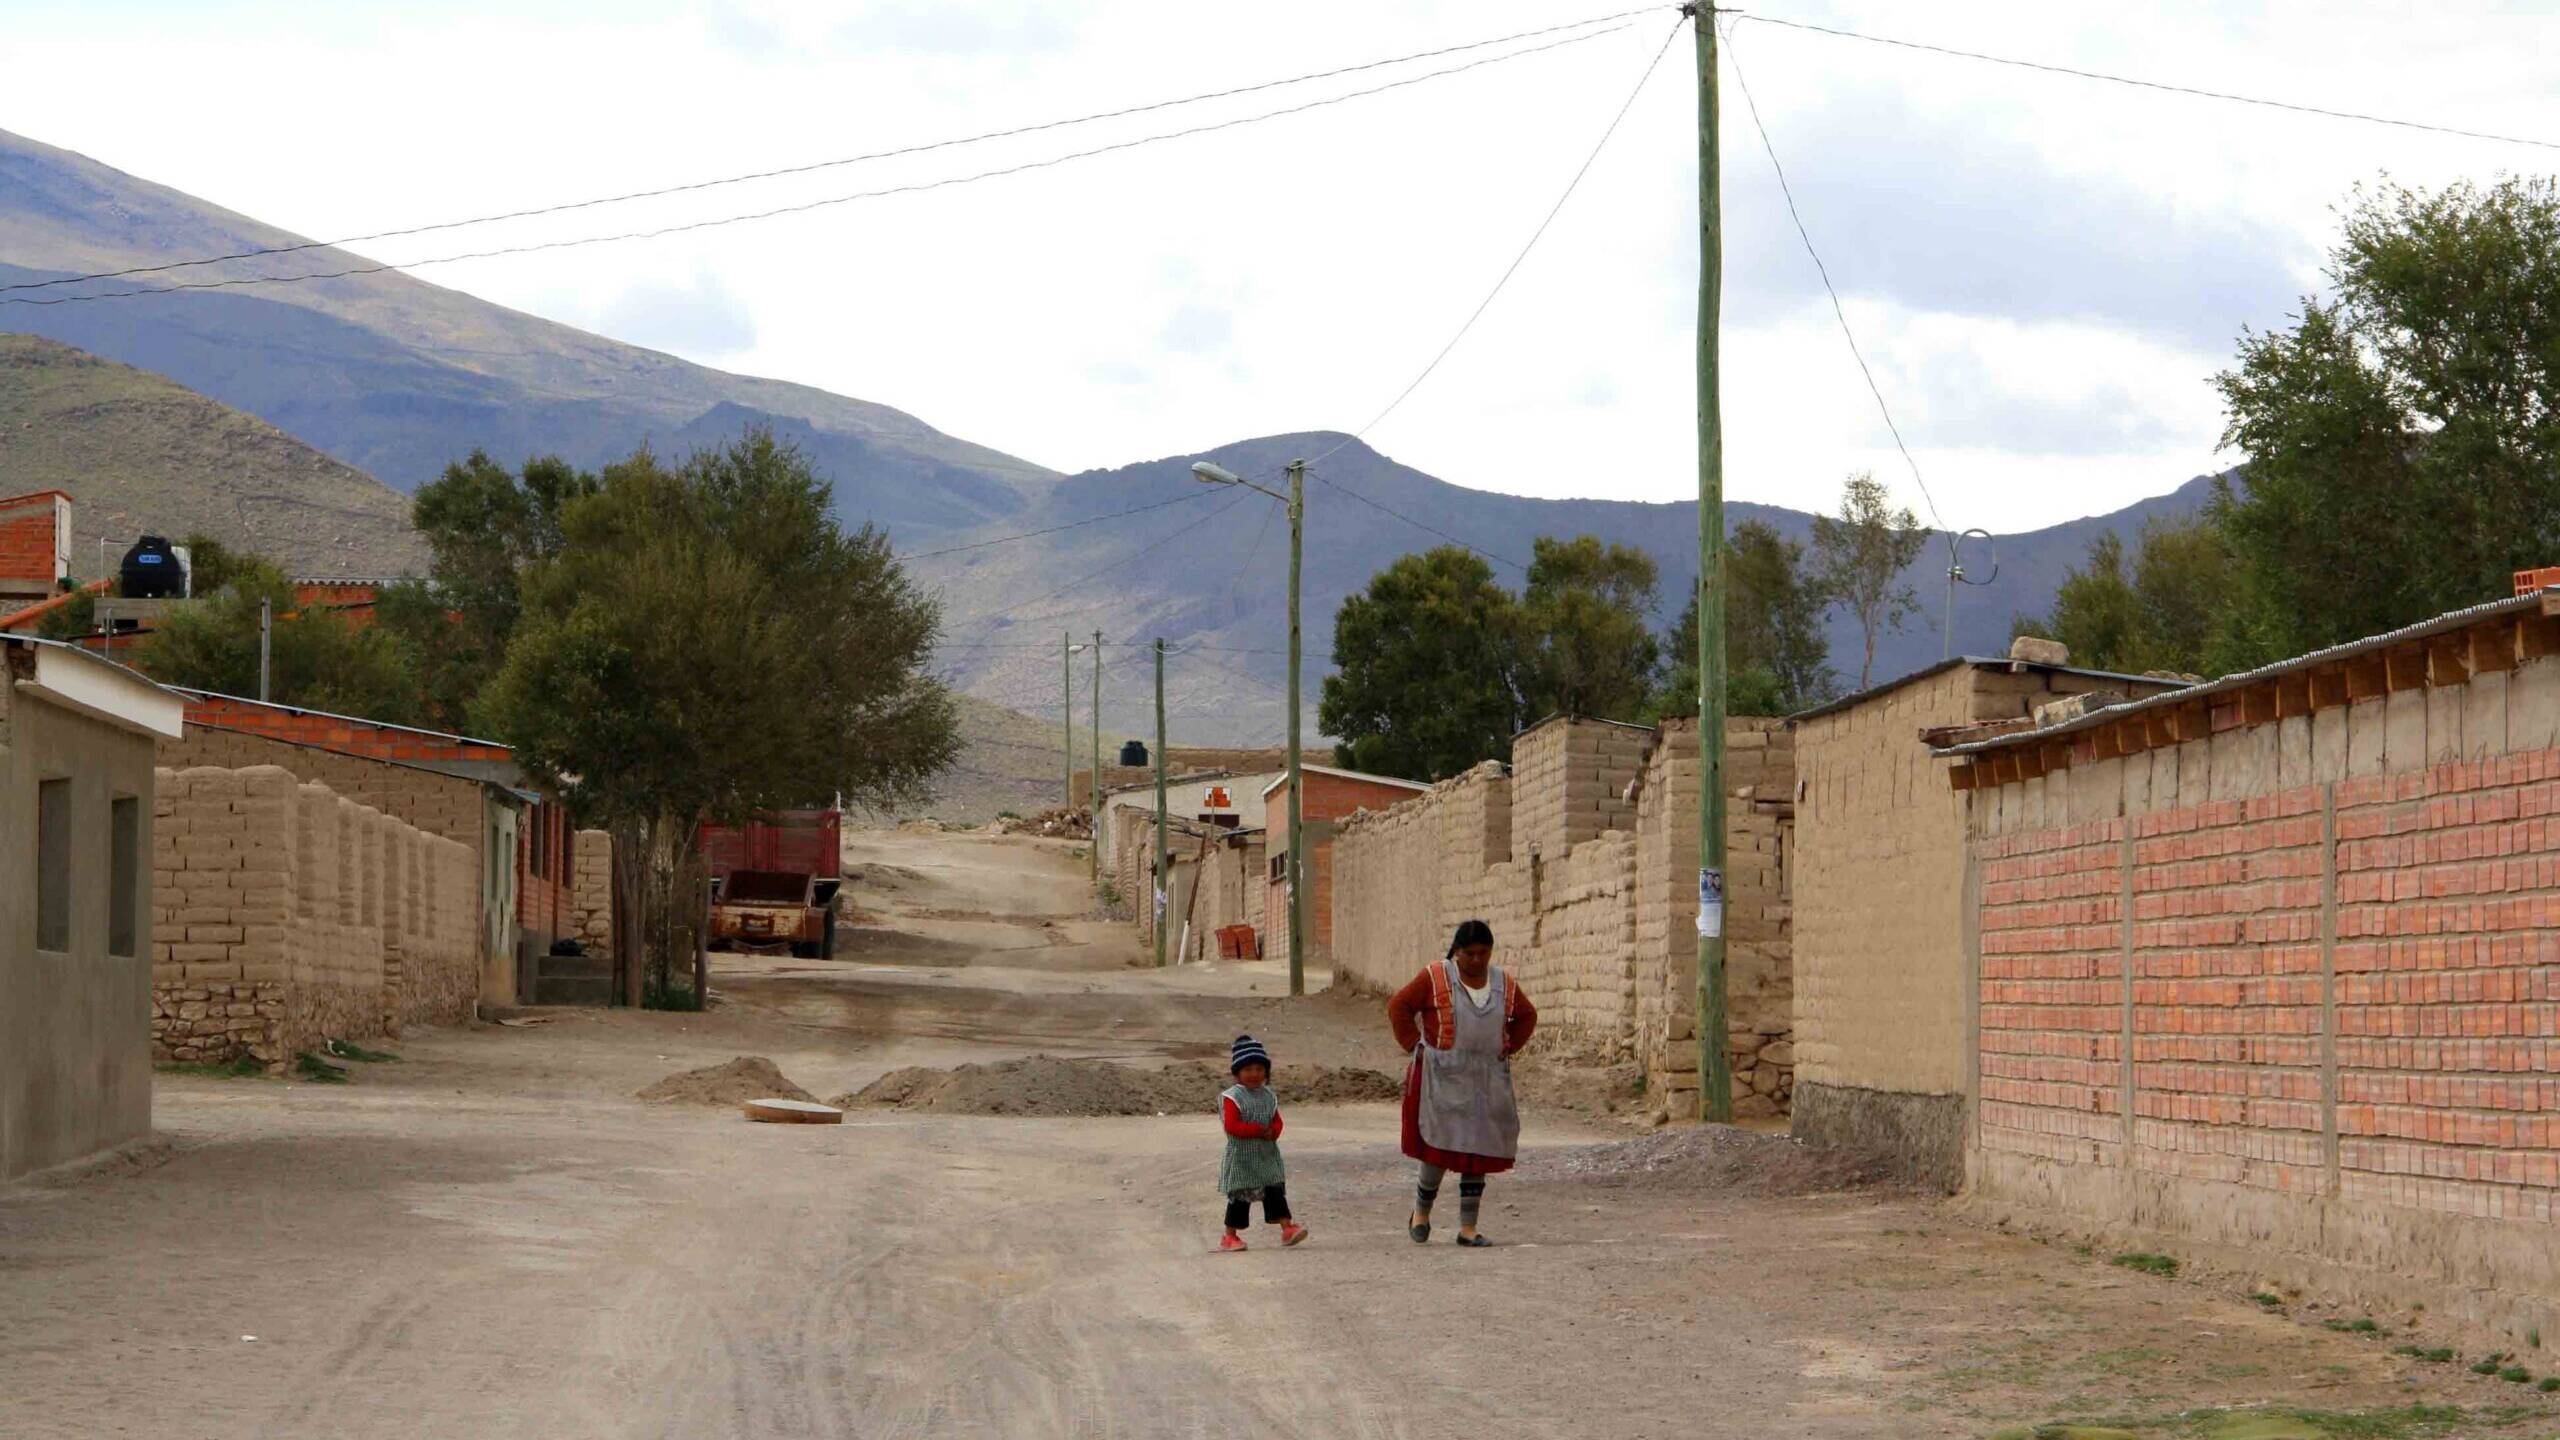 town uyuni tour bolivian woman and child